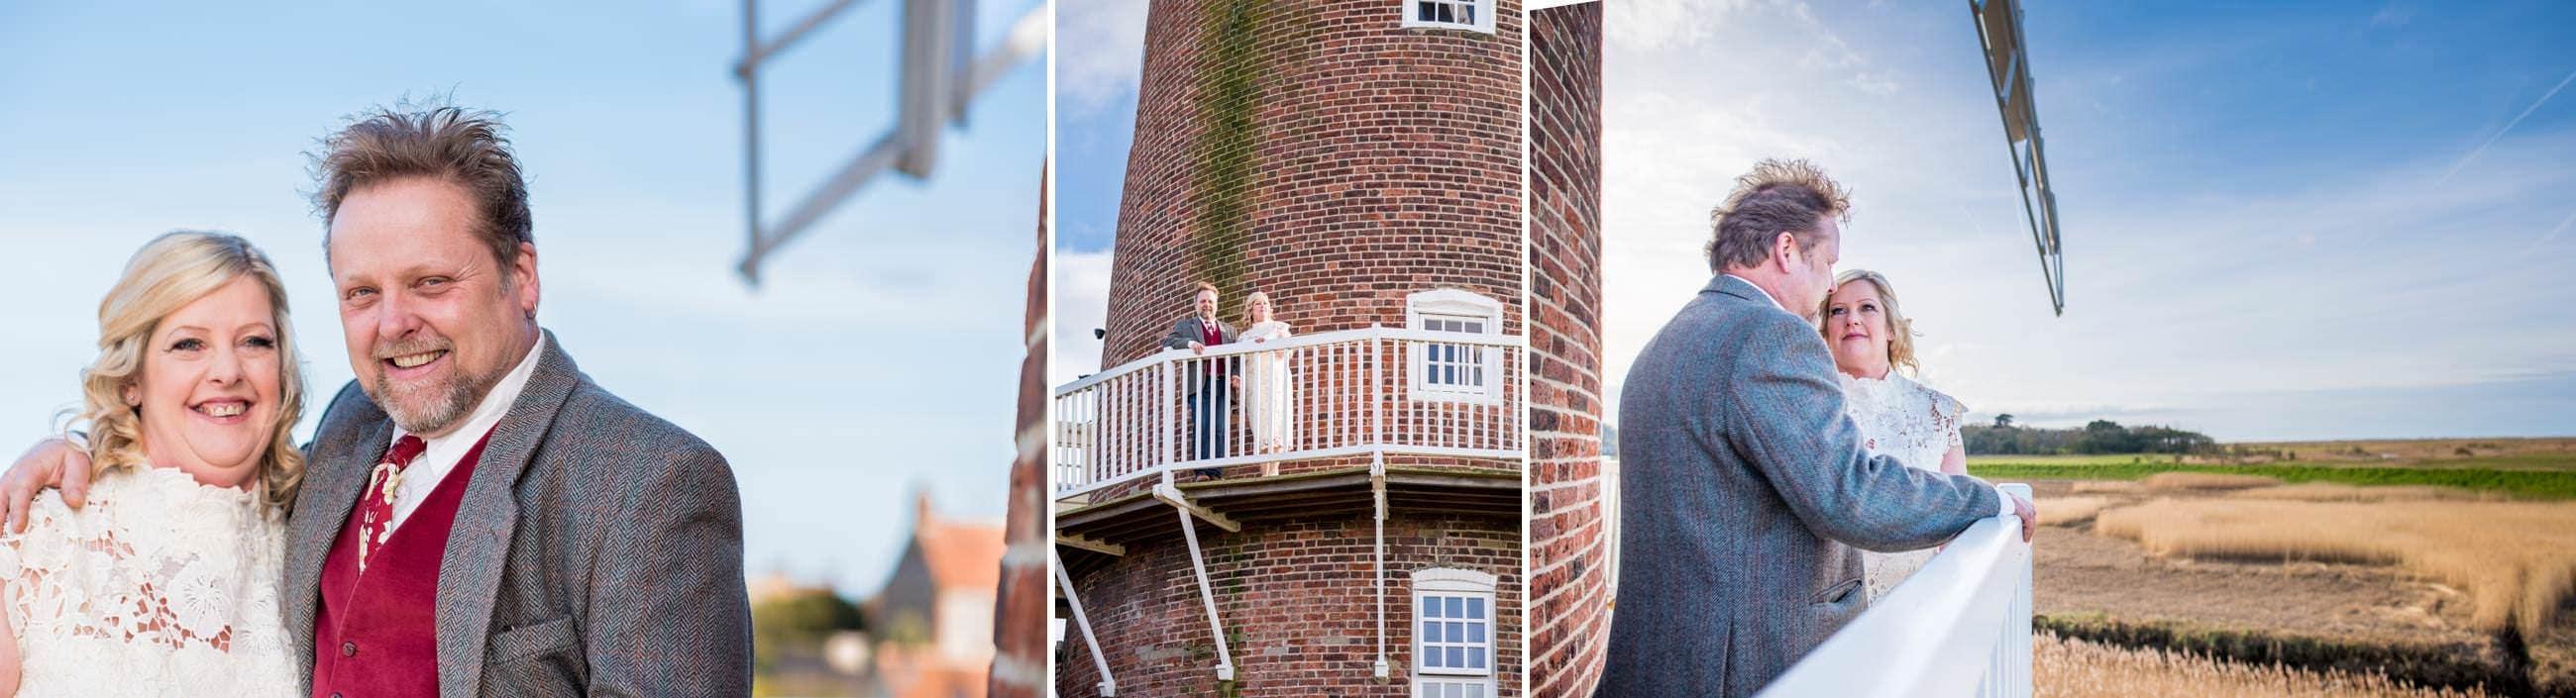 Nicola_Andy_Cley_Windmill_Norfolk_Wedding 8